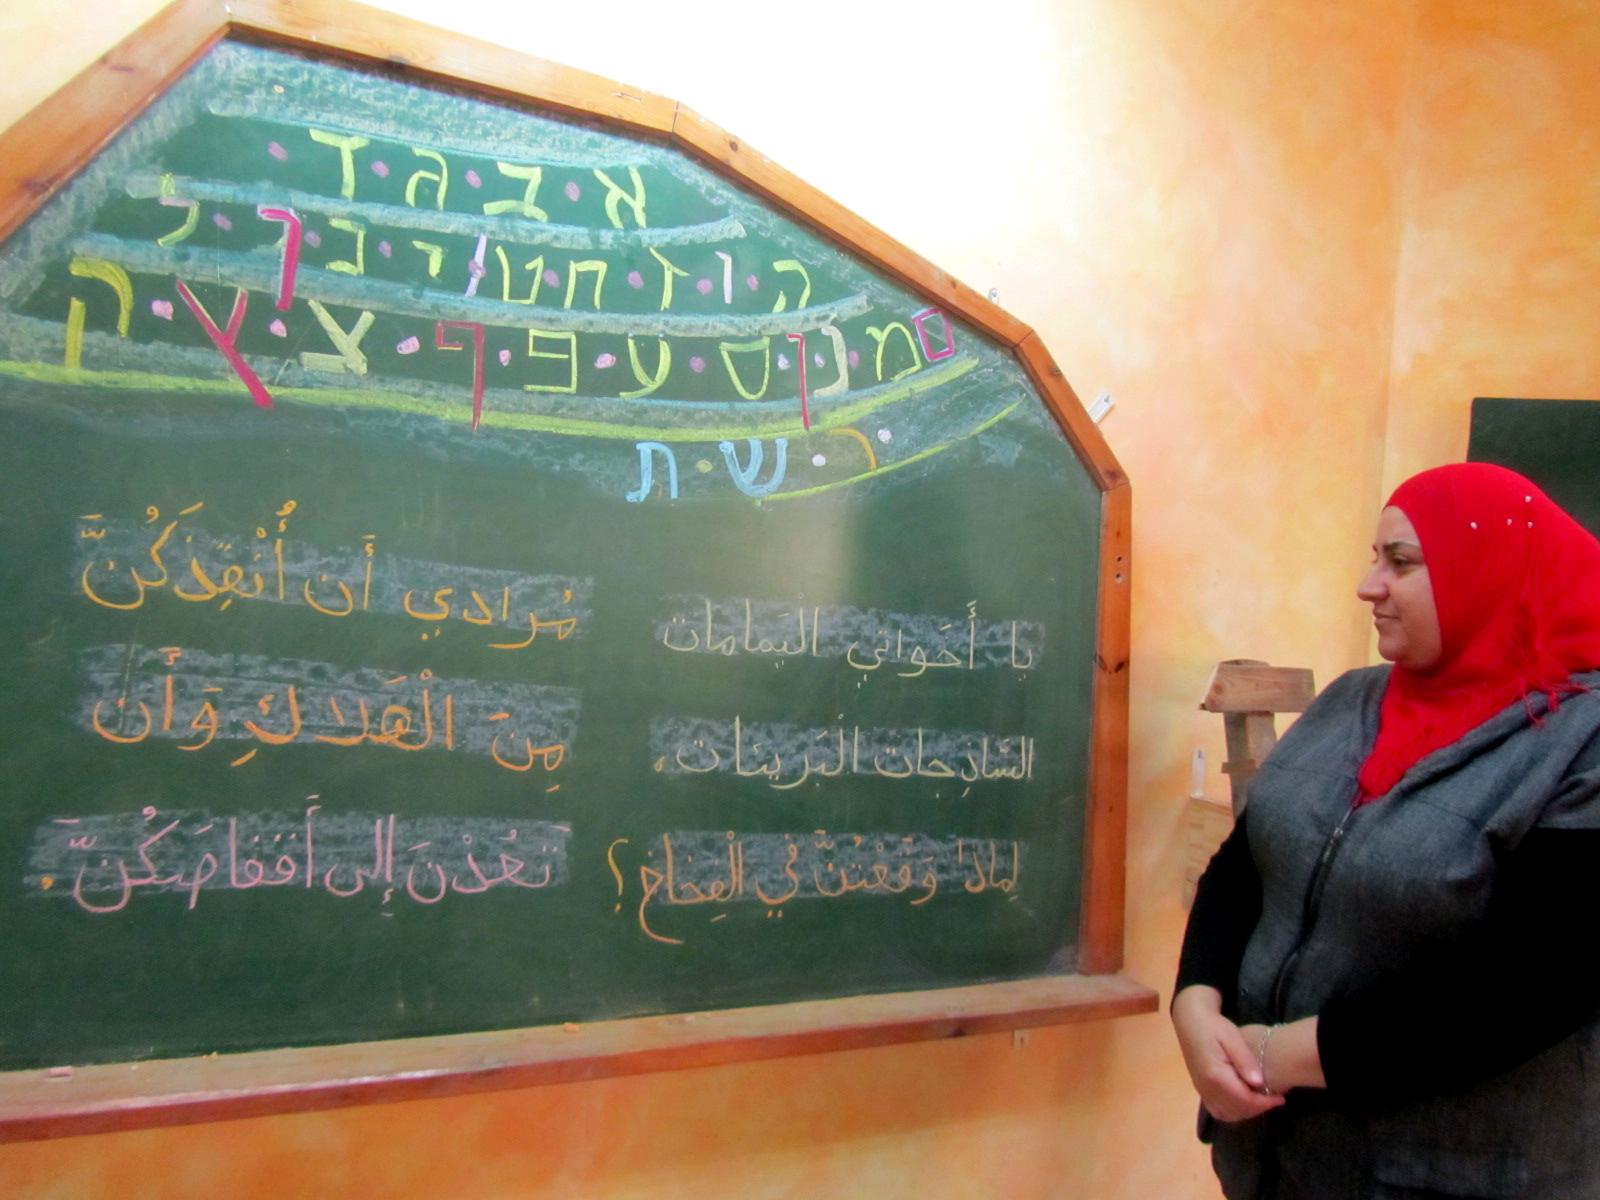 , at blackboardBalkis, Arabic speaking teacher